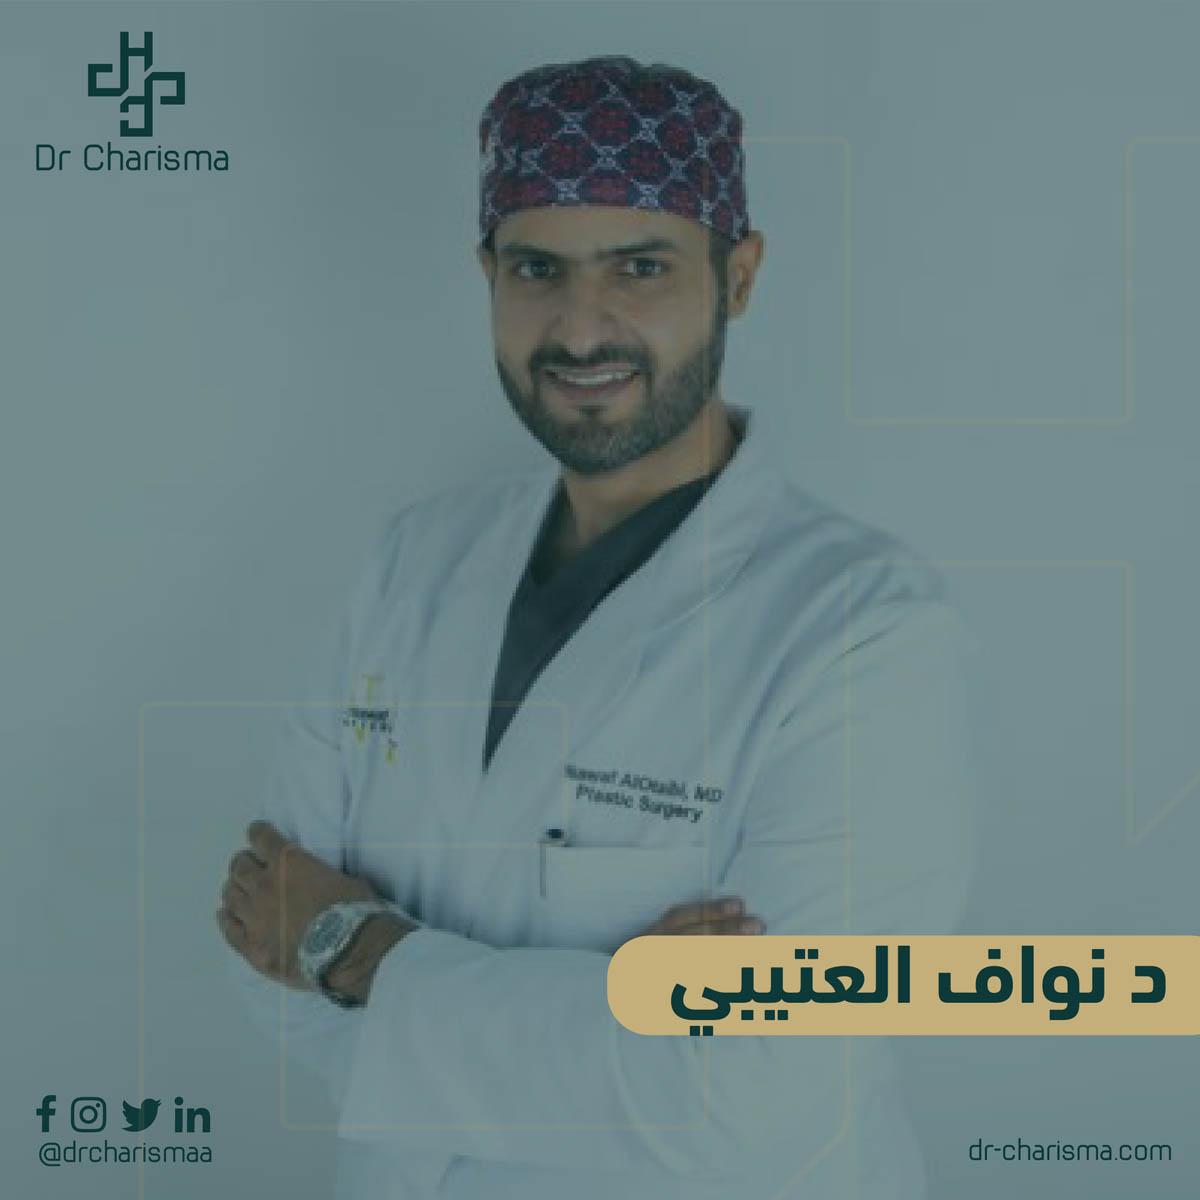 Dr Nawaf Al-Otaibi